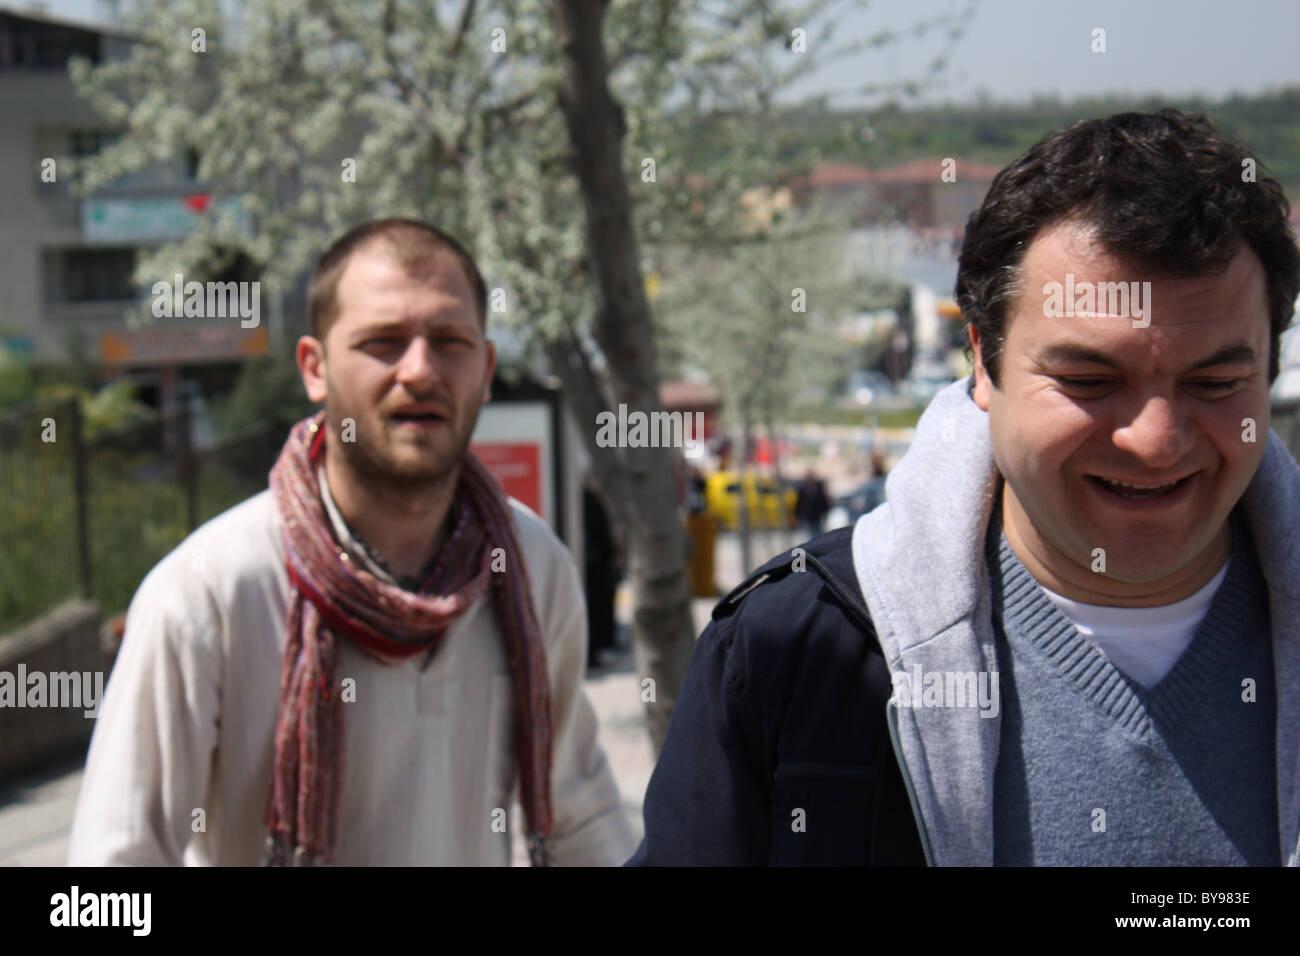 https www alamy com stock photo prensesin uykusu year 2010 turkey director agan irmak alican ycesoy 34010018 html